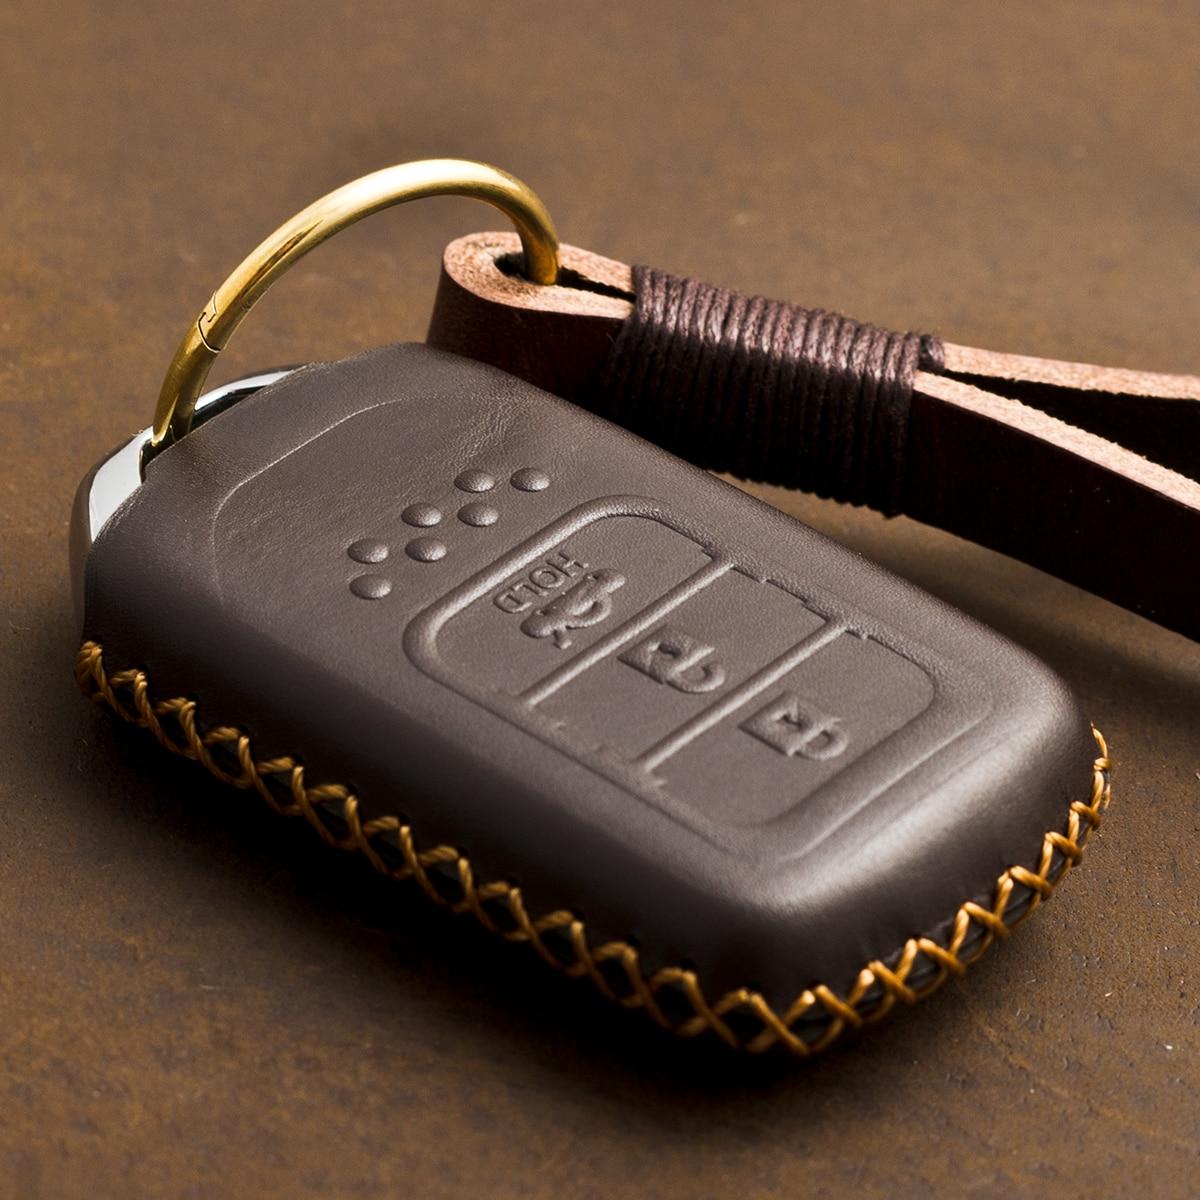 1 PCS Genuine Leather Remote Keyless Key Case Key Cover Holder For Accord Vezel Civic Pilot CRV HRV JAZZ Key Shell Bag For Honda